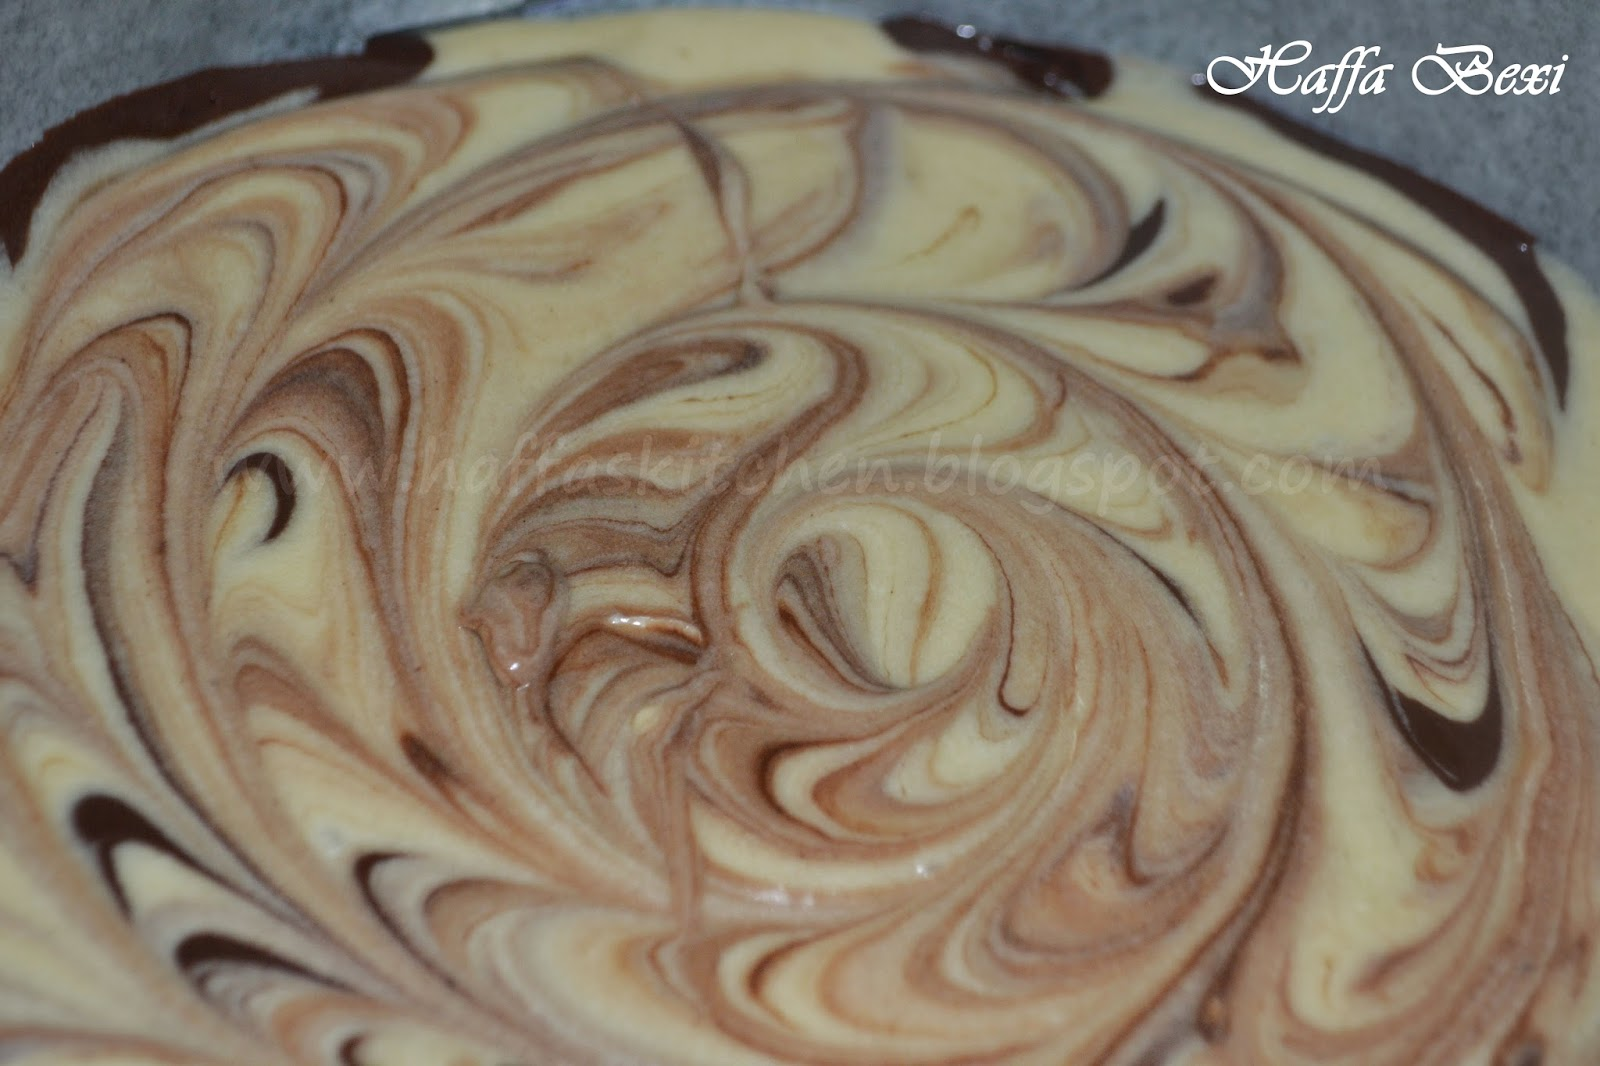 Chocolate and vanilla marble cake  marble cake  birthday cake recipes  how to make marble cake how to make a marble cake  chocolate marble cake  marble cake recipe  marble cake ingredients  making marble cake 